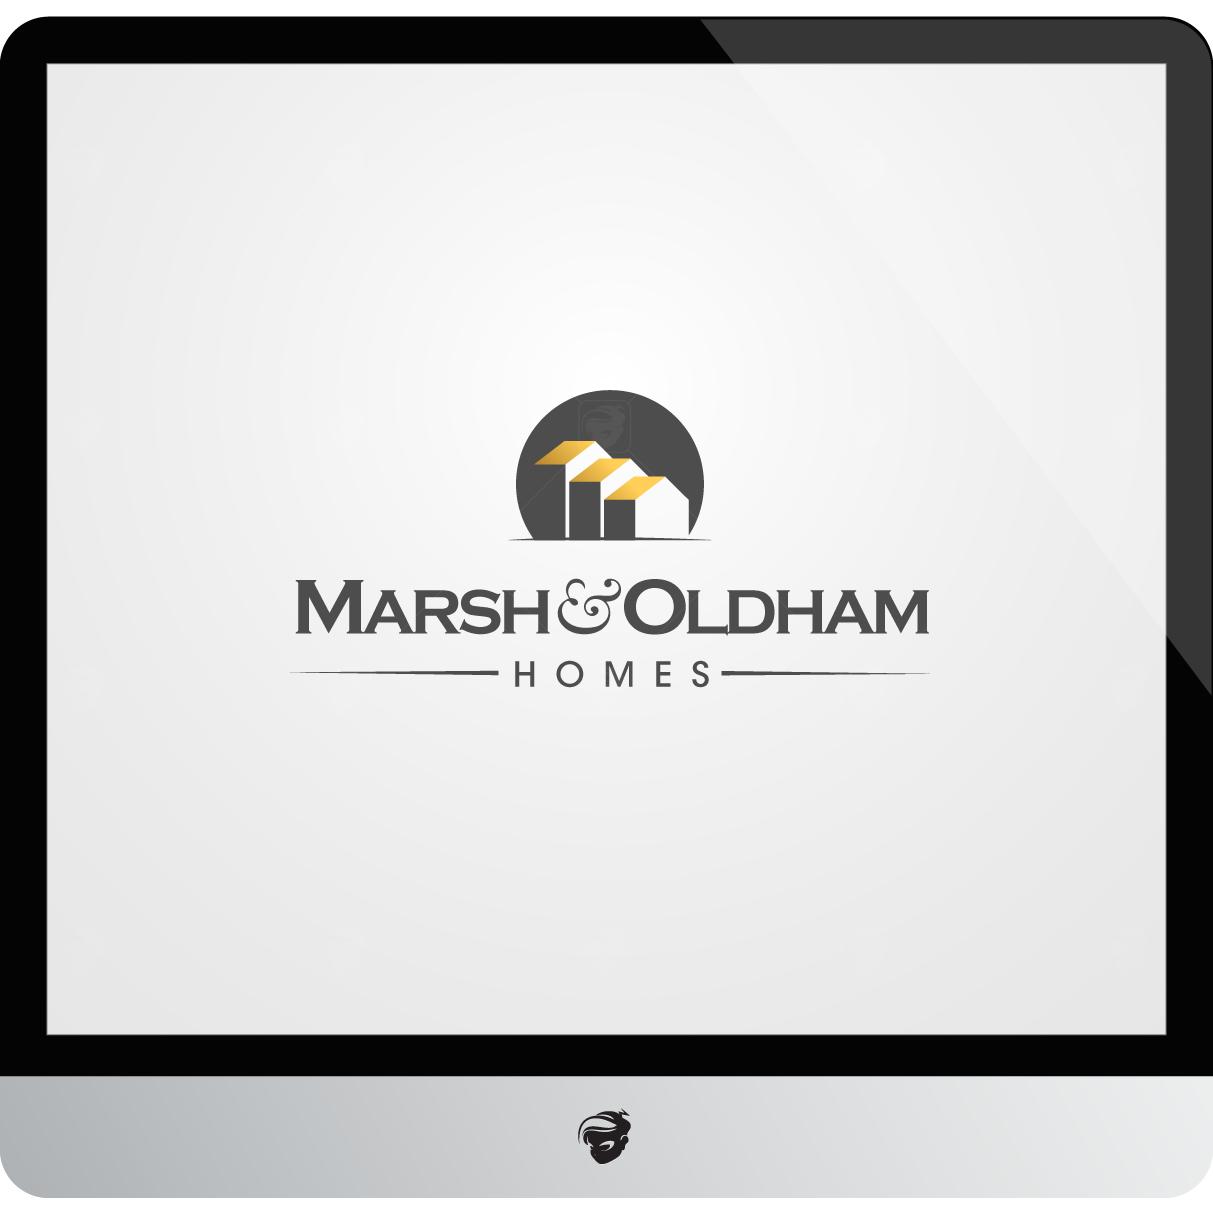 Logo Design by zesthar - Entry No. 201 in the Logo Design Contest Artistic Logo Design for Marsh & Oldham Homes.